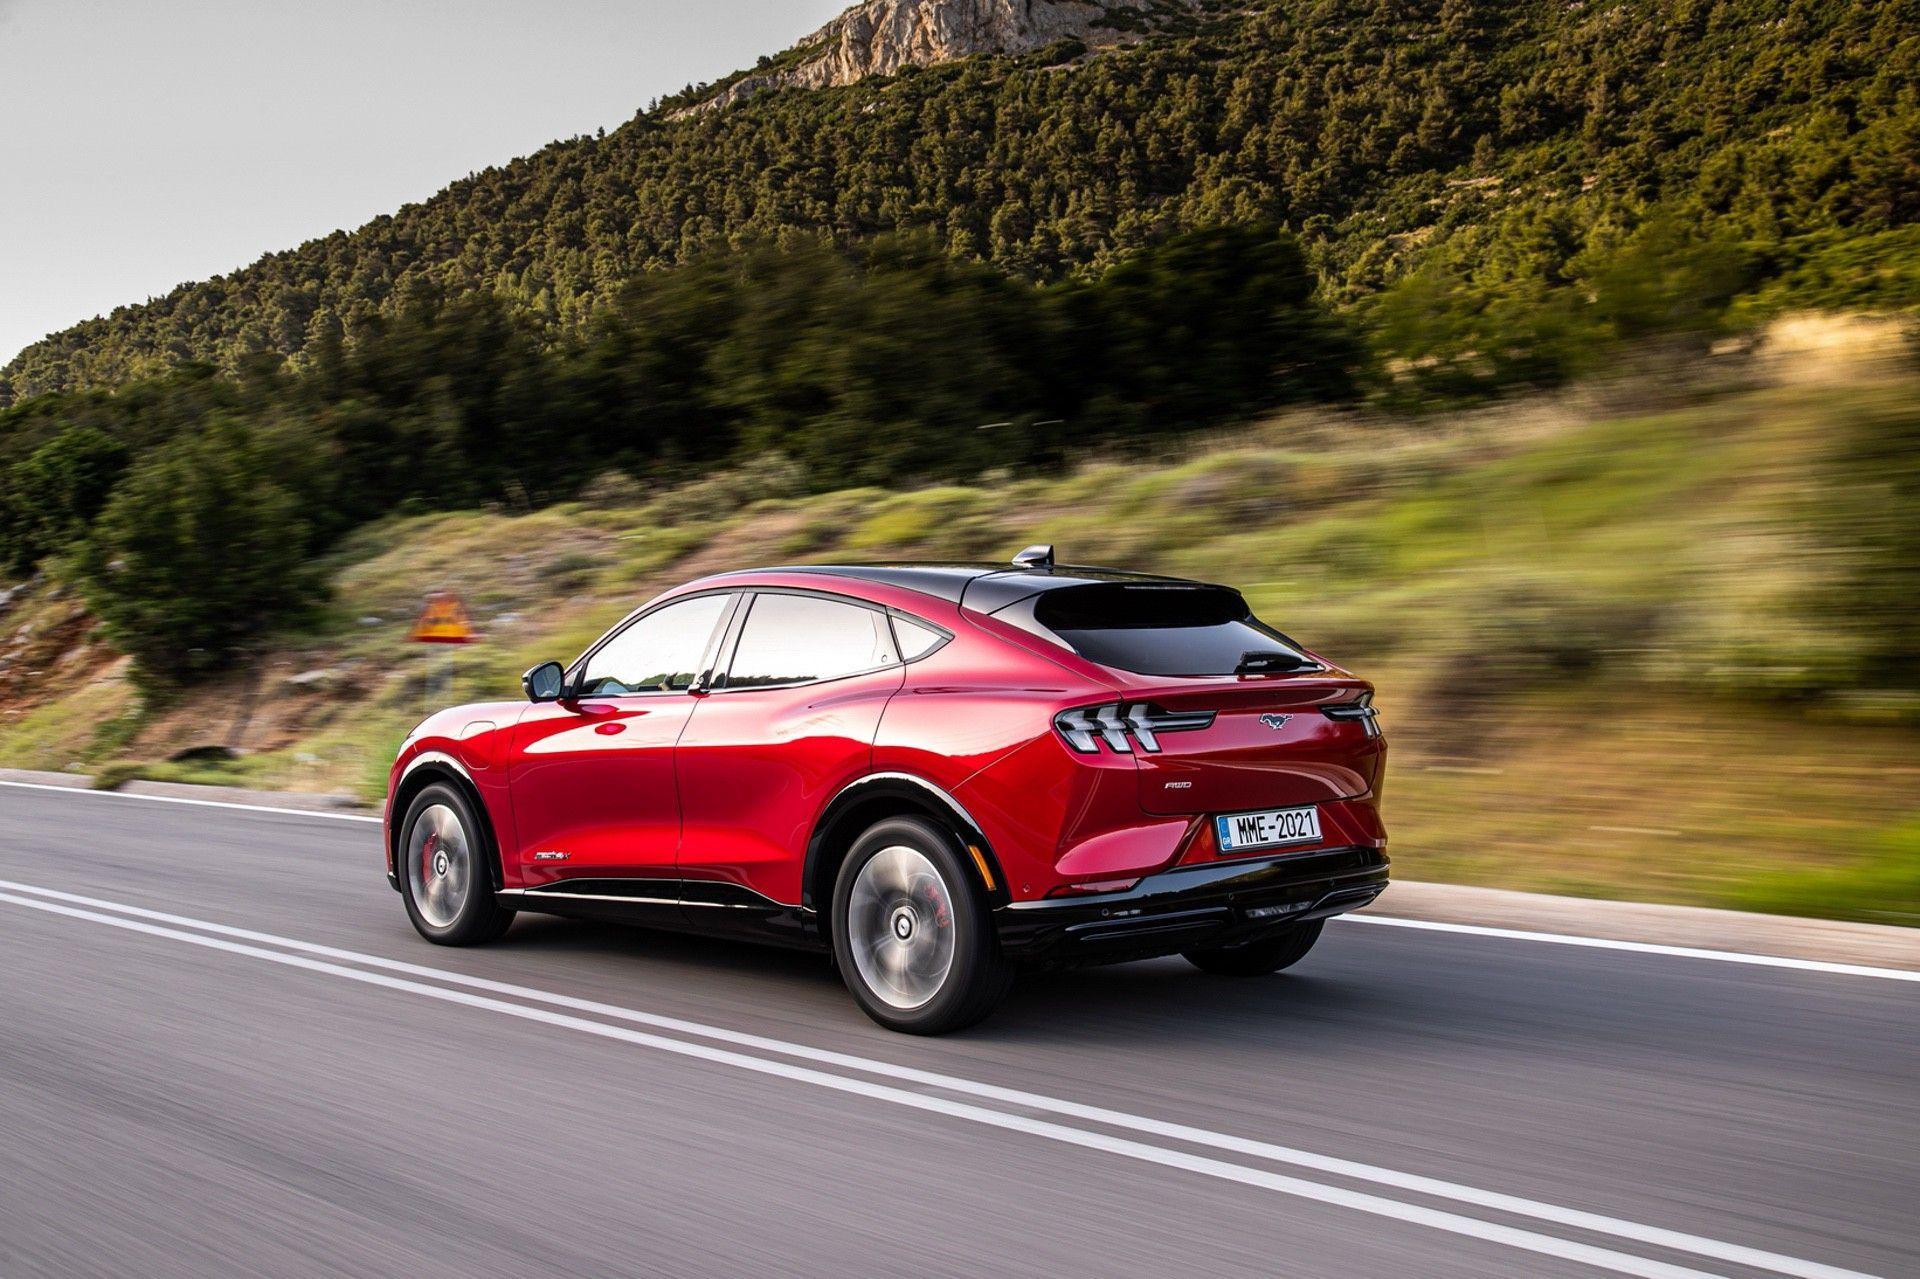 Ford_Mustang_Mach-E_greek_presskit-0126